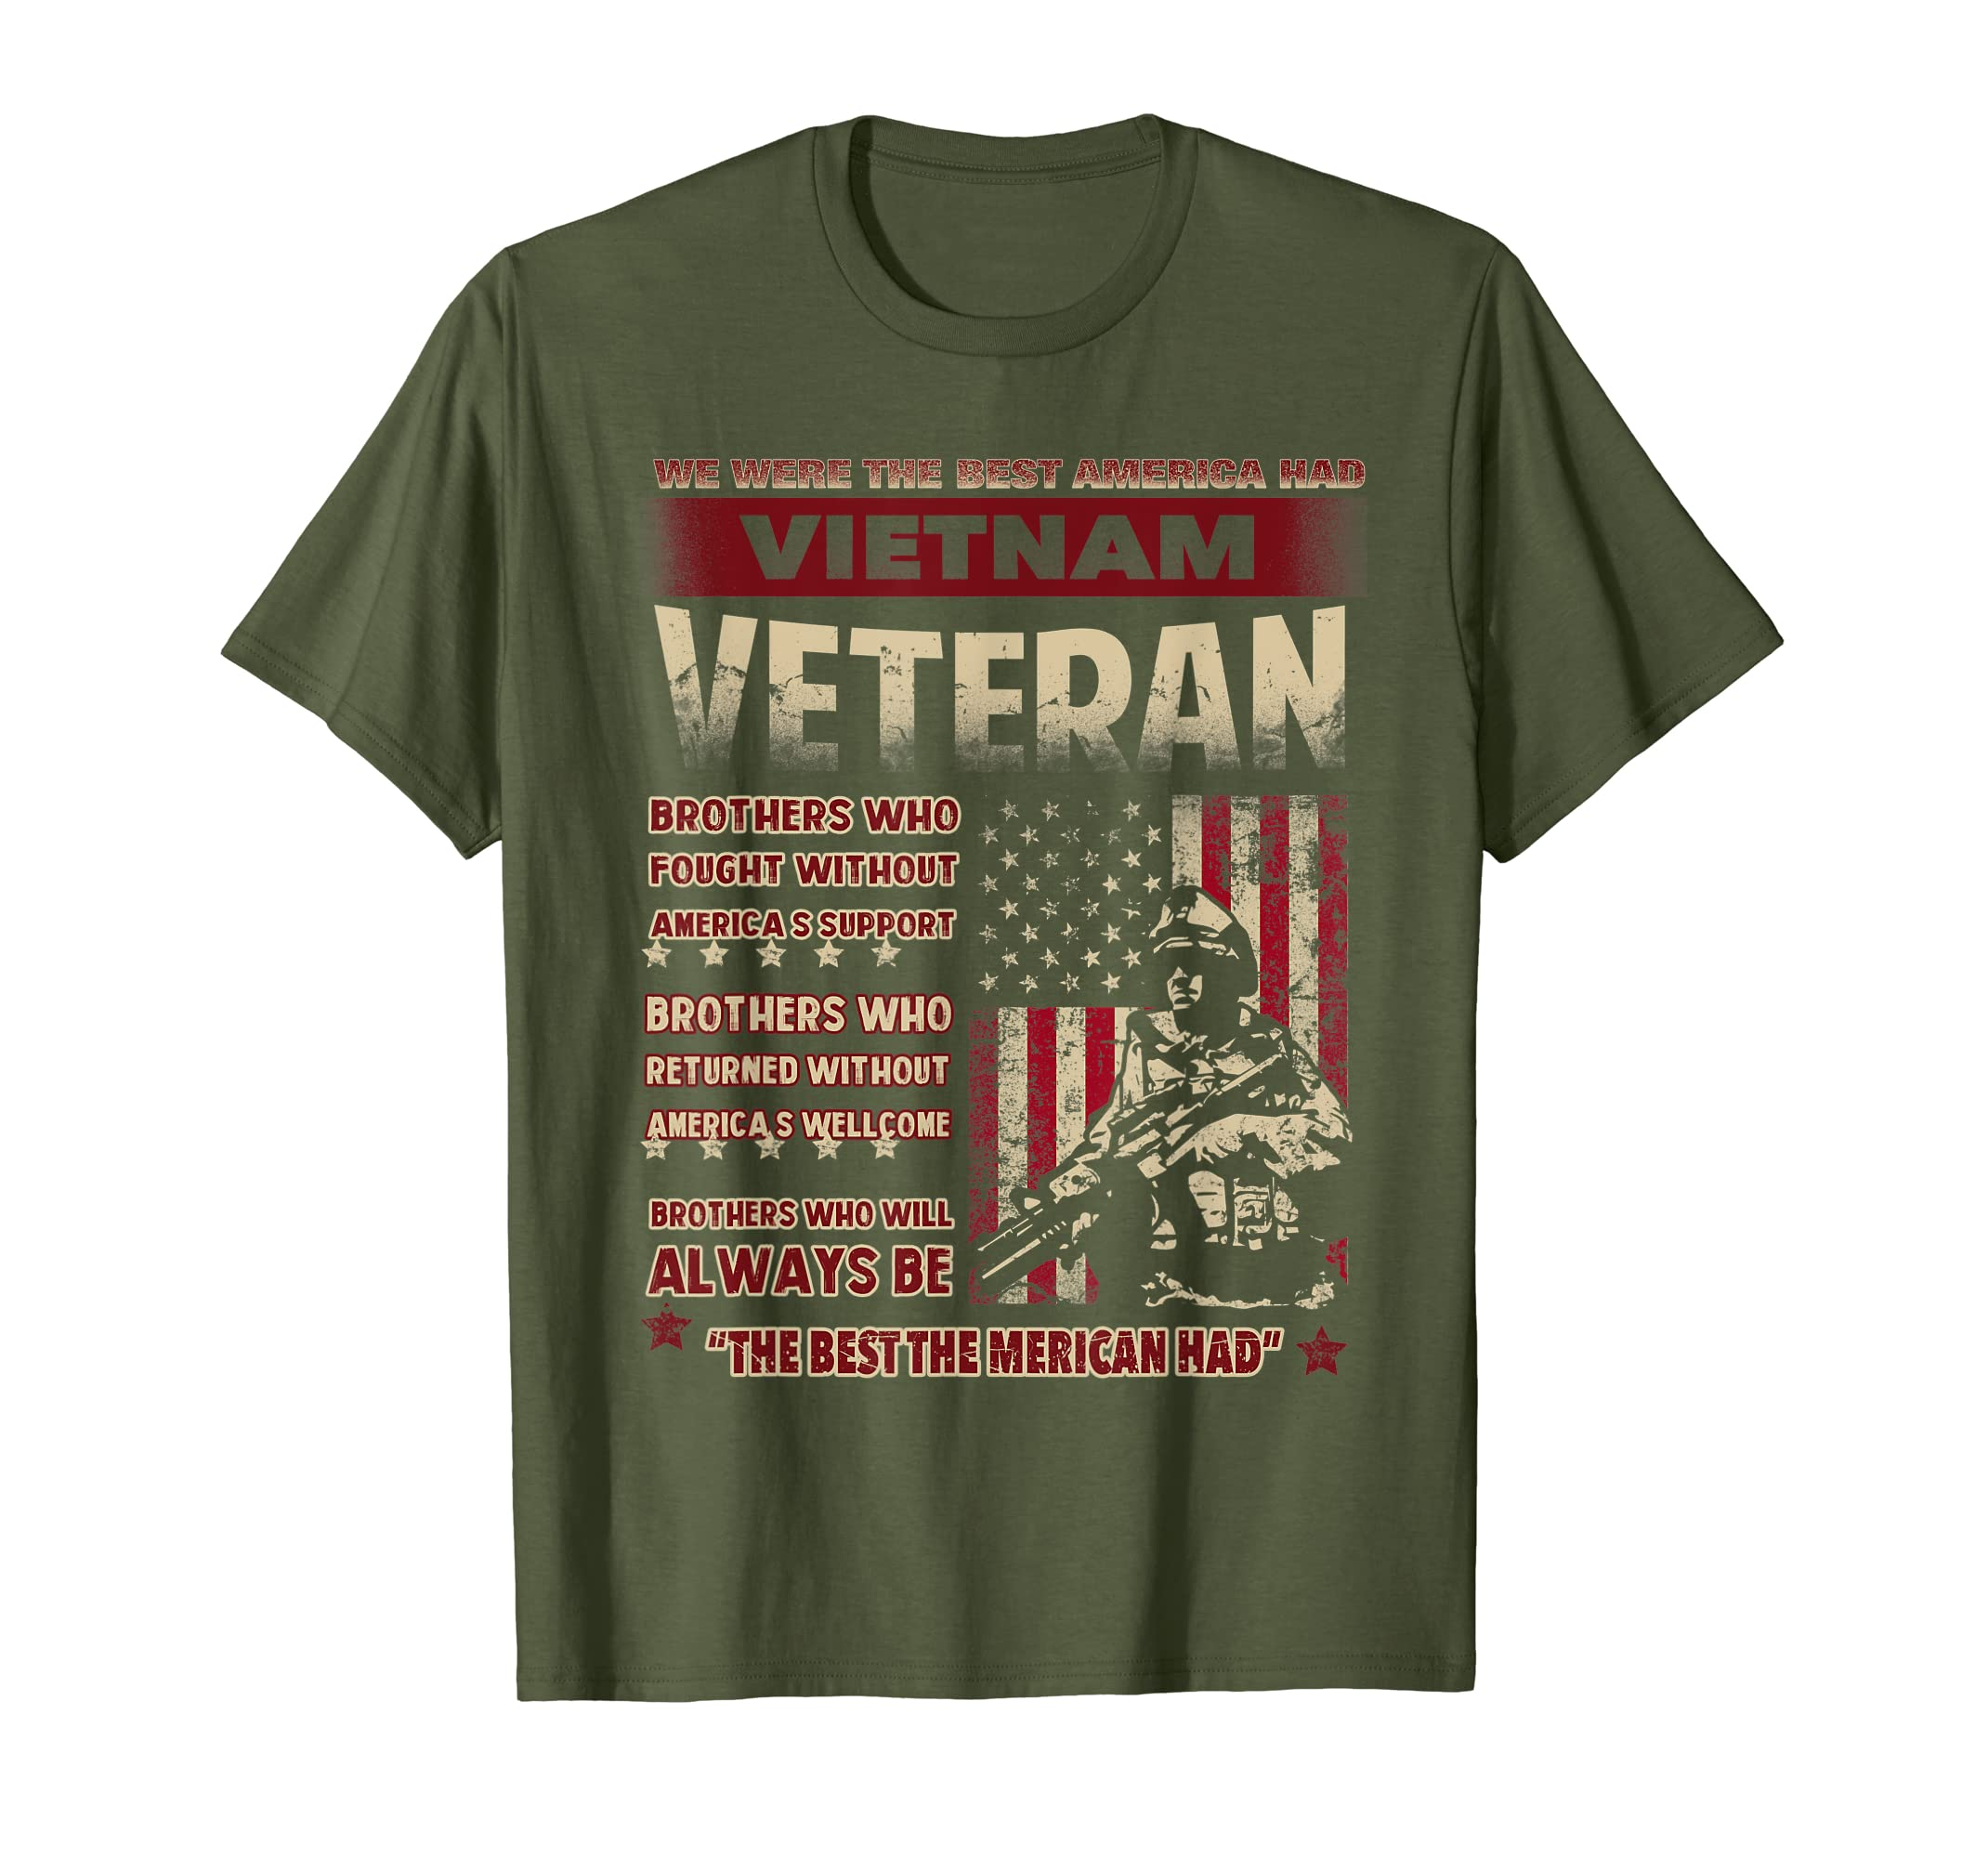 199ff7b3 Amazon.com: Mens Vietnam Veteran Shirt - Best Gift For Veteran Day 2017:  Clothing